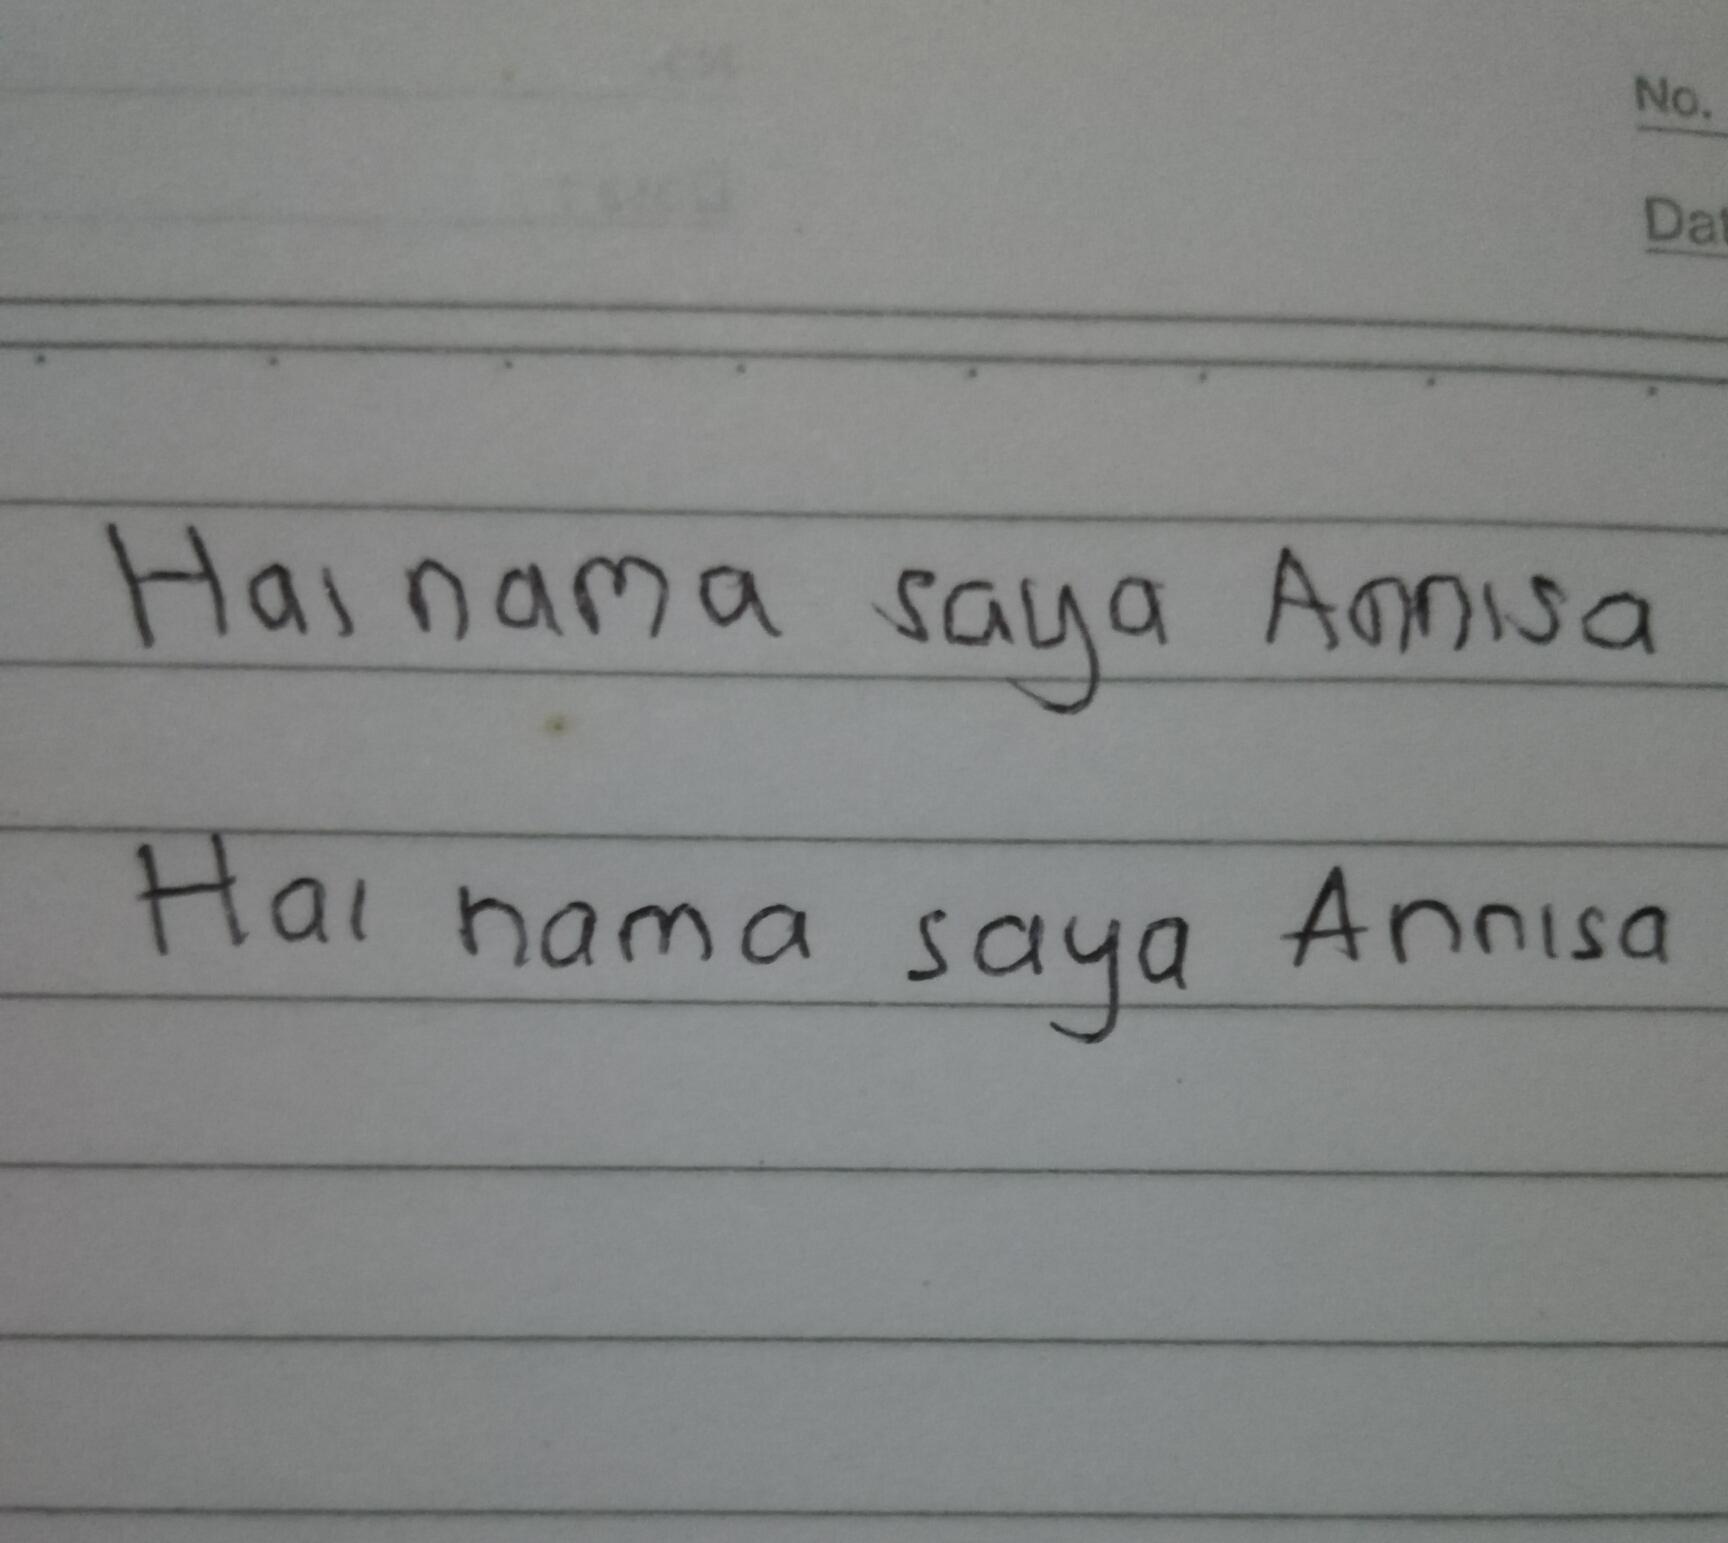 Tulisan tangan kanan dan kiri